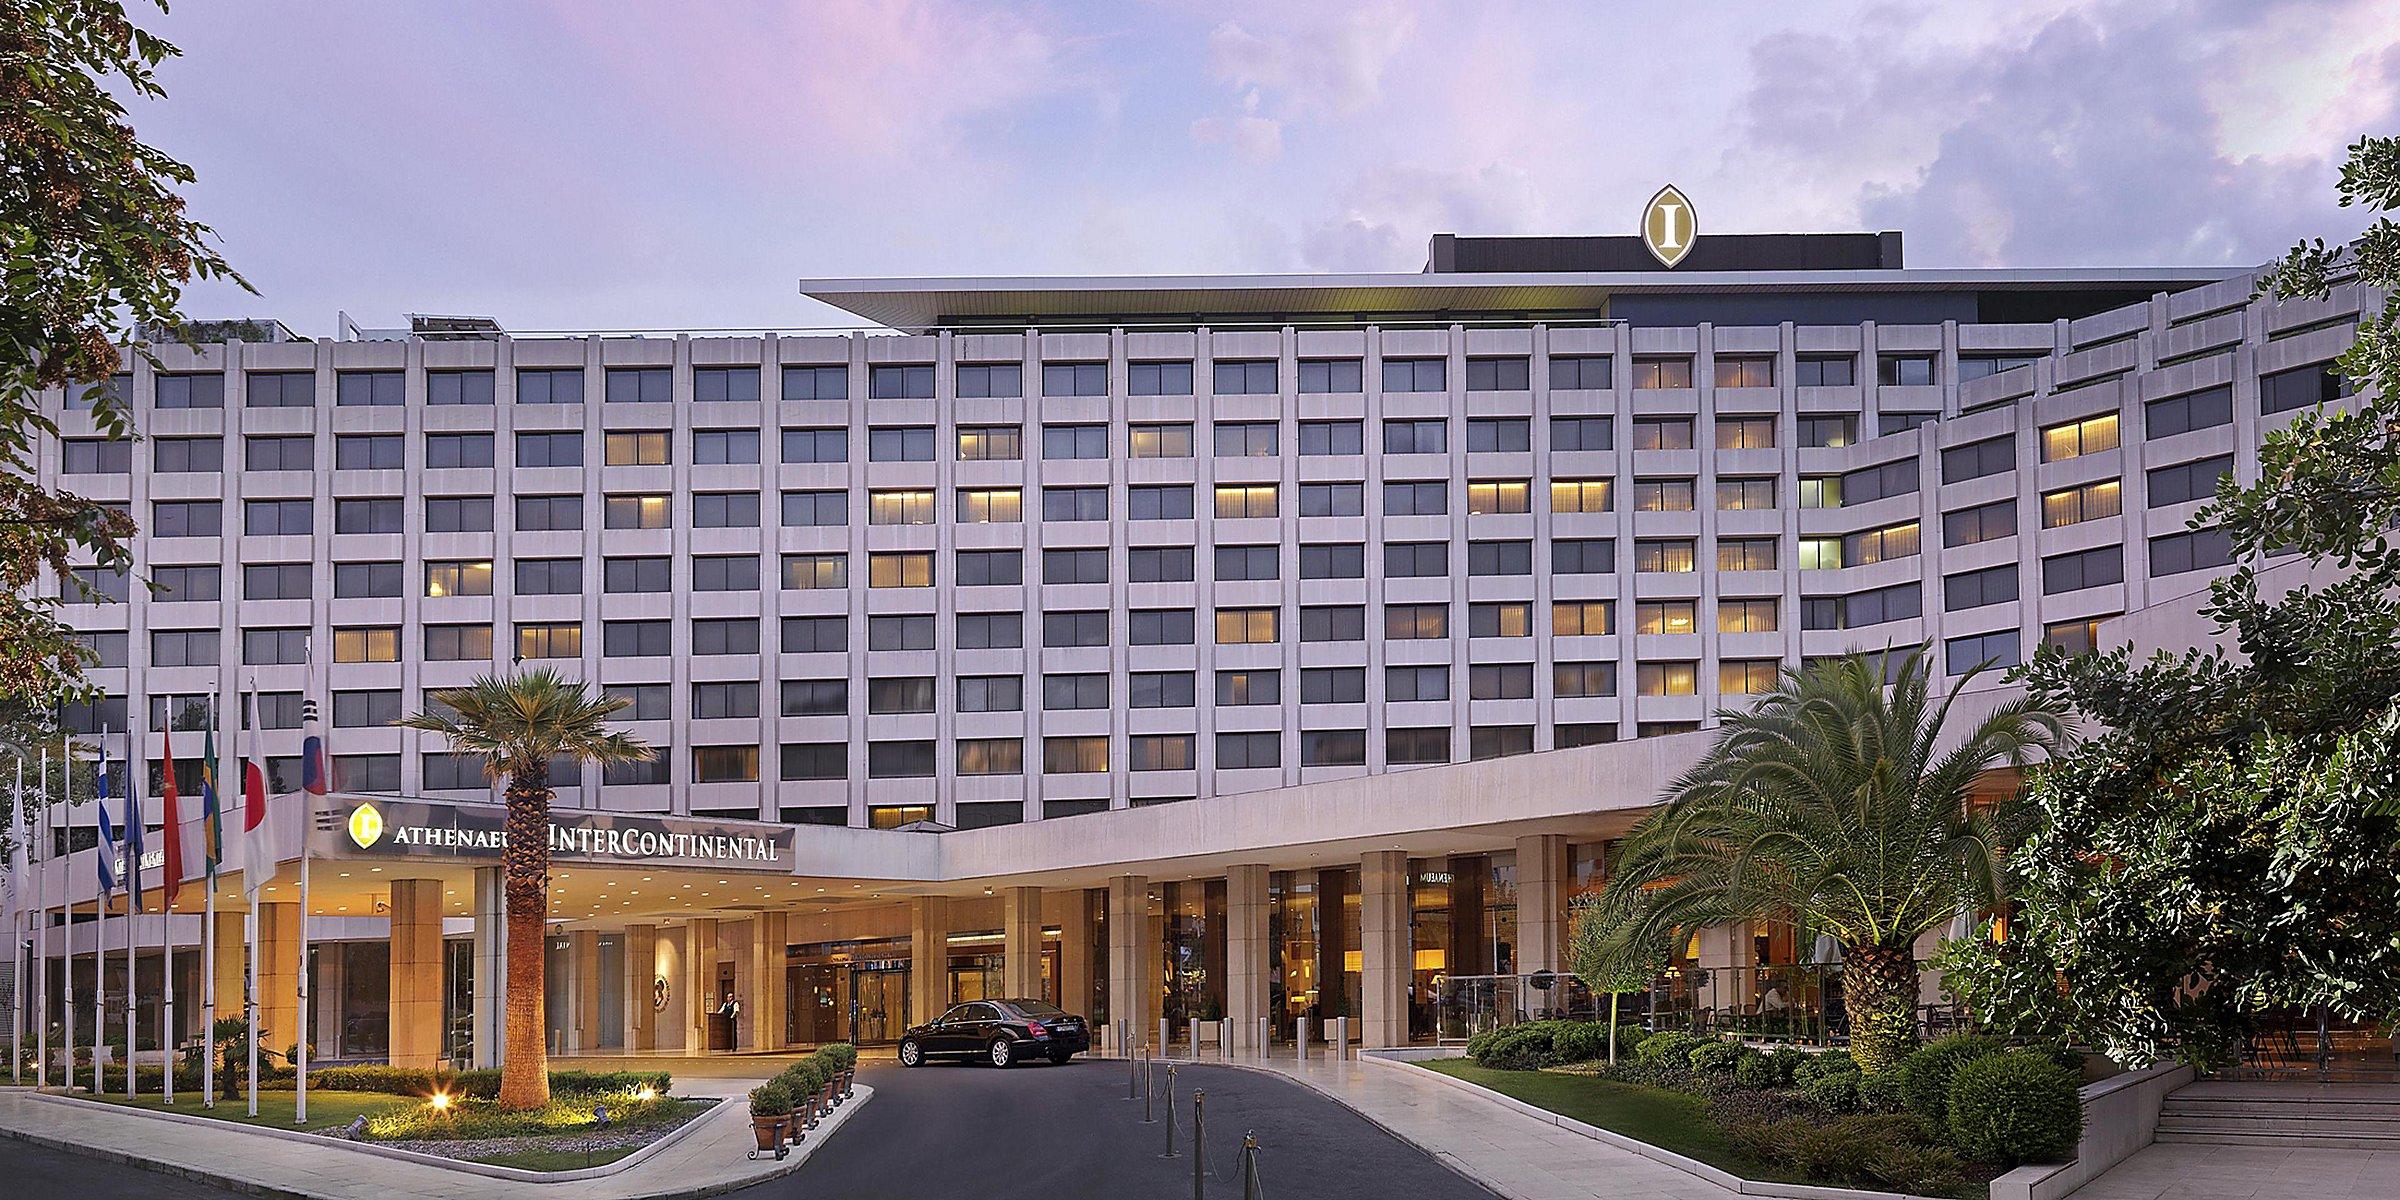 Luxury 5 Star Hotel Intercontinental Athenaeum Athens